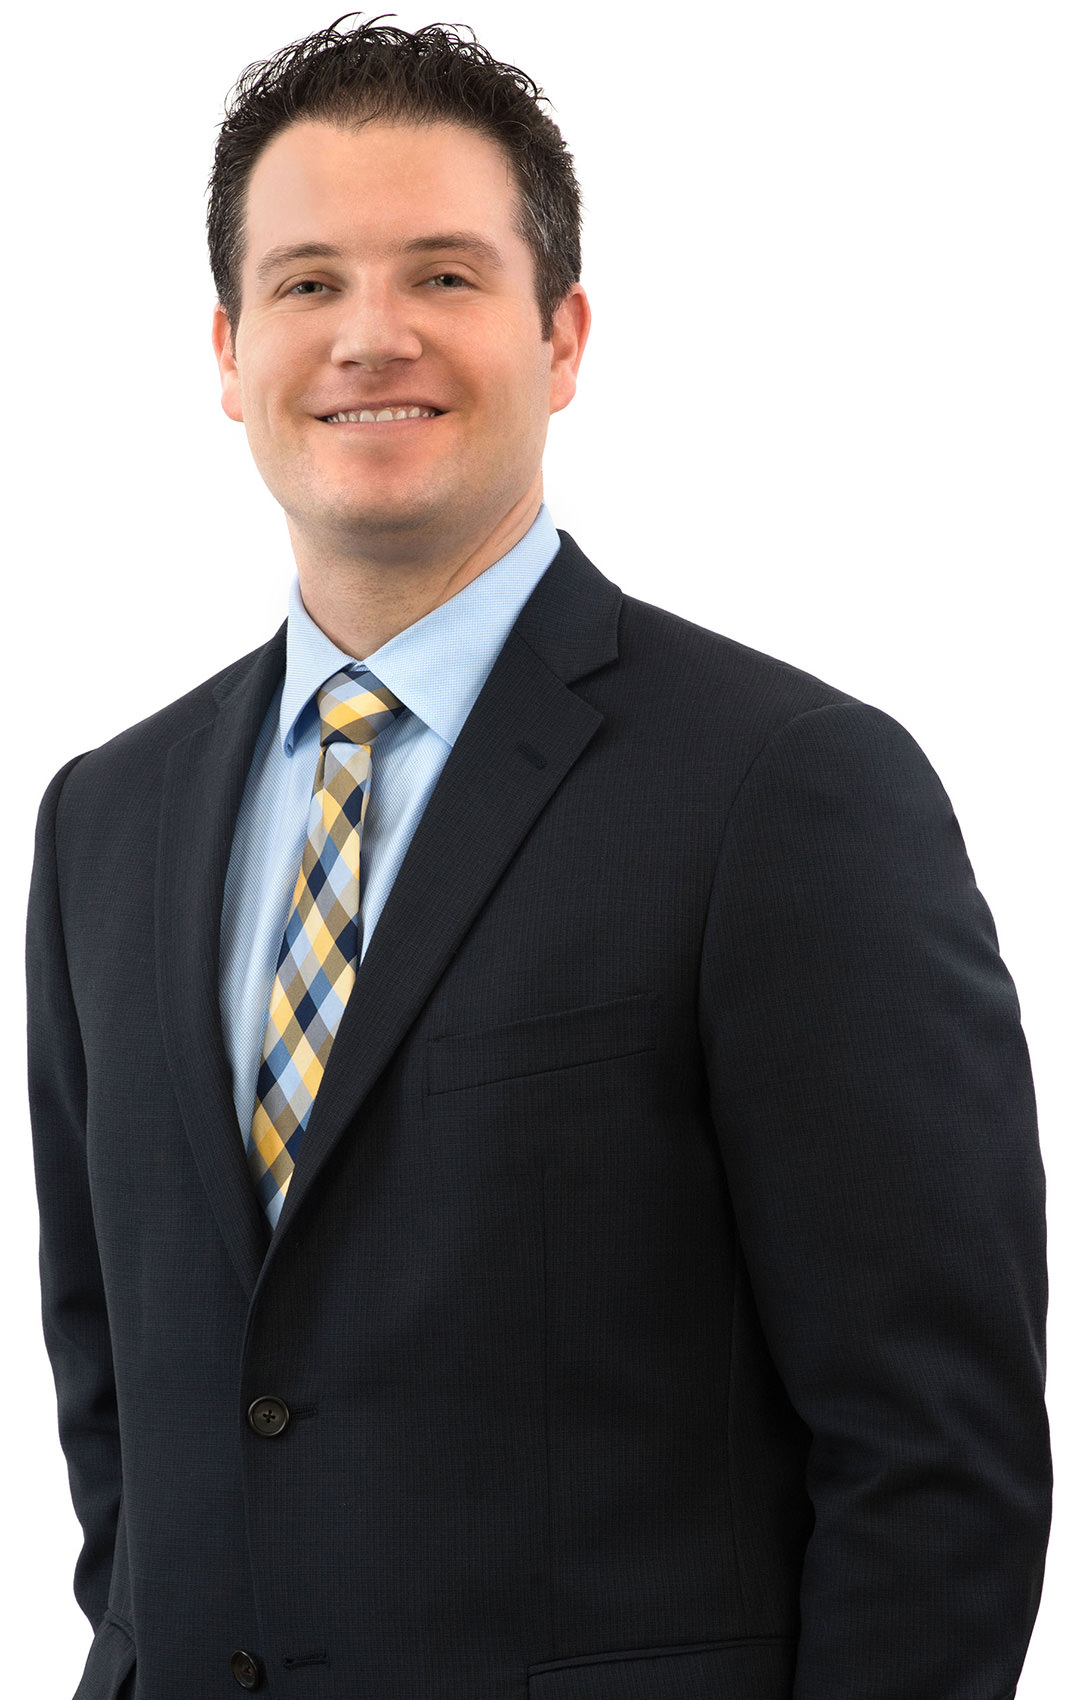 Kevin Polansky